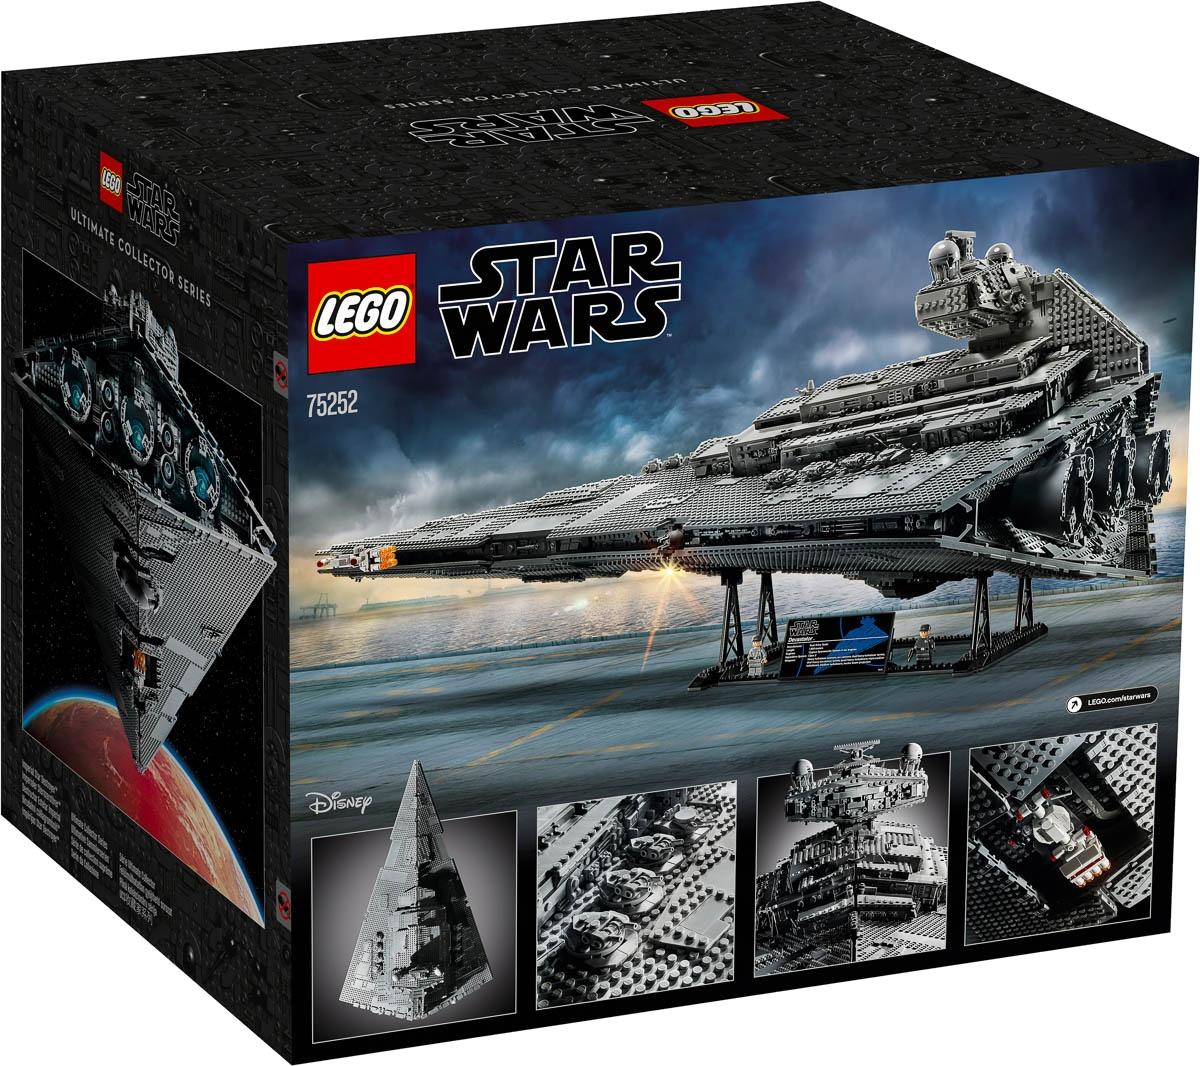 lego-star-wars-75252-ucs-isd-2019-0002.jpg